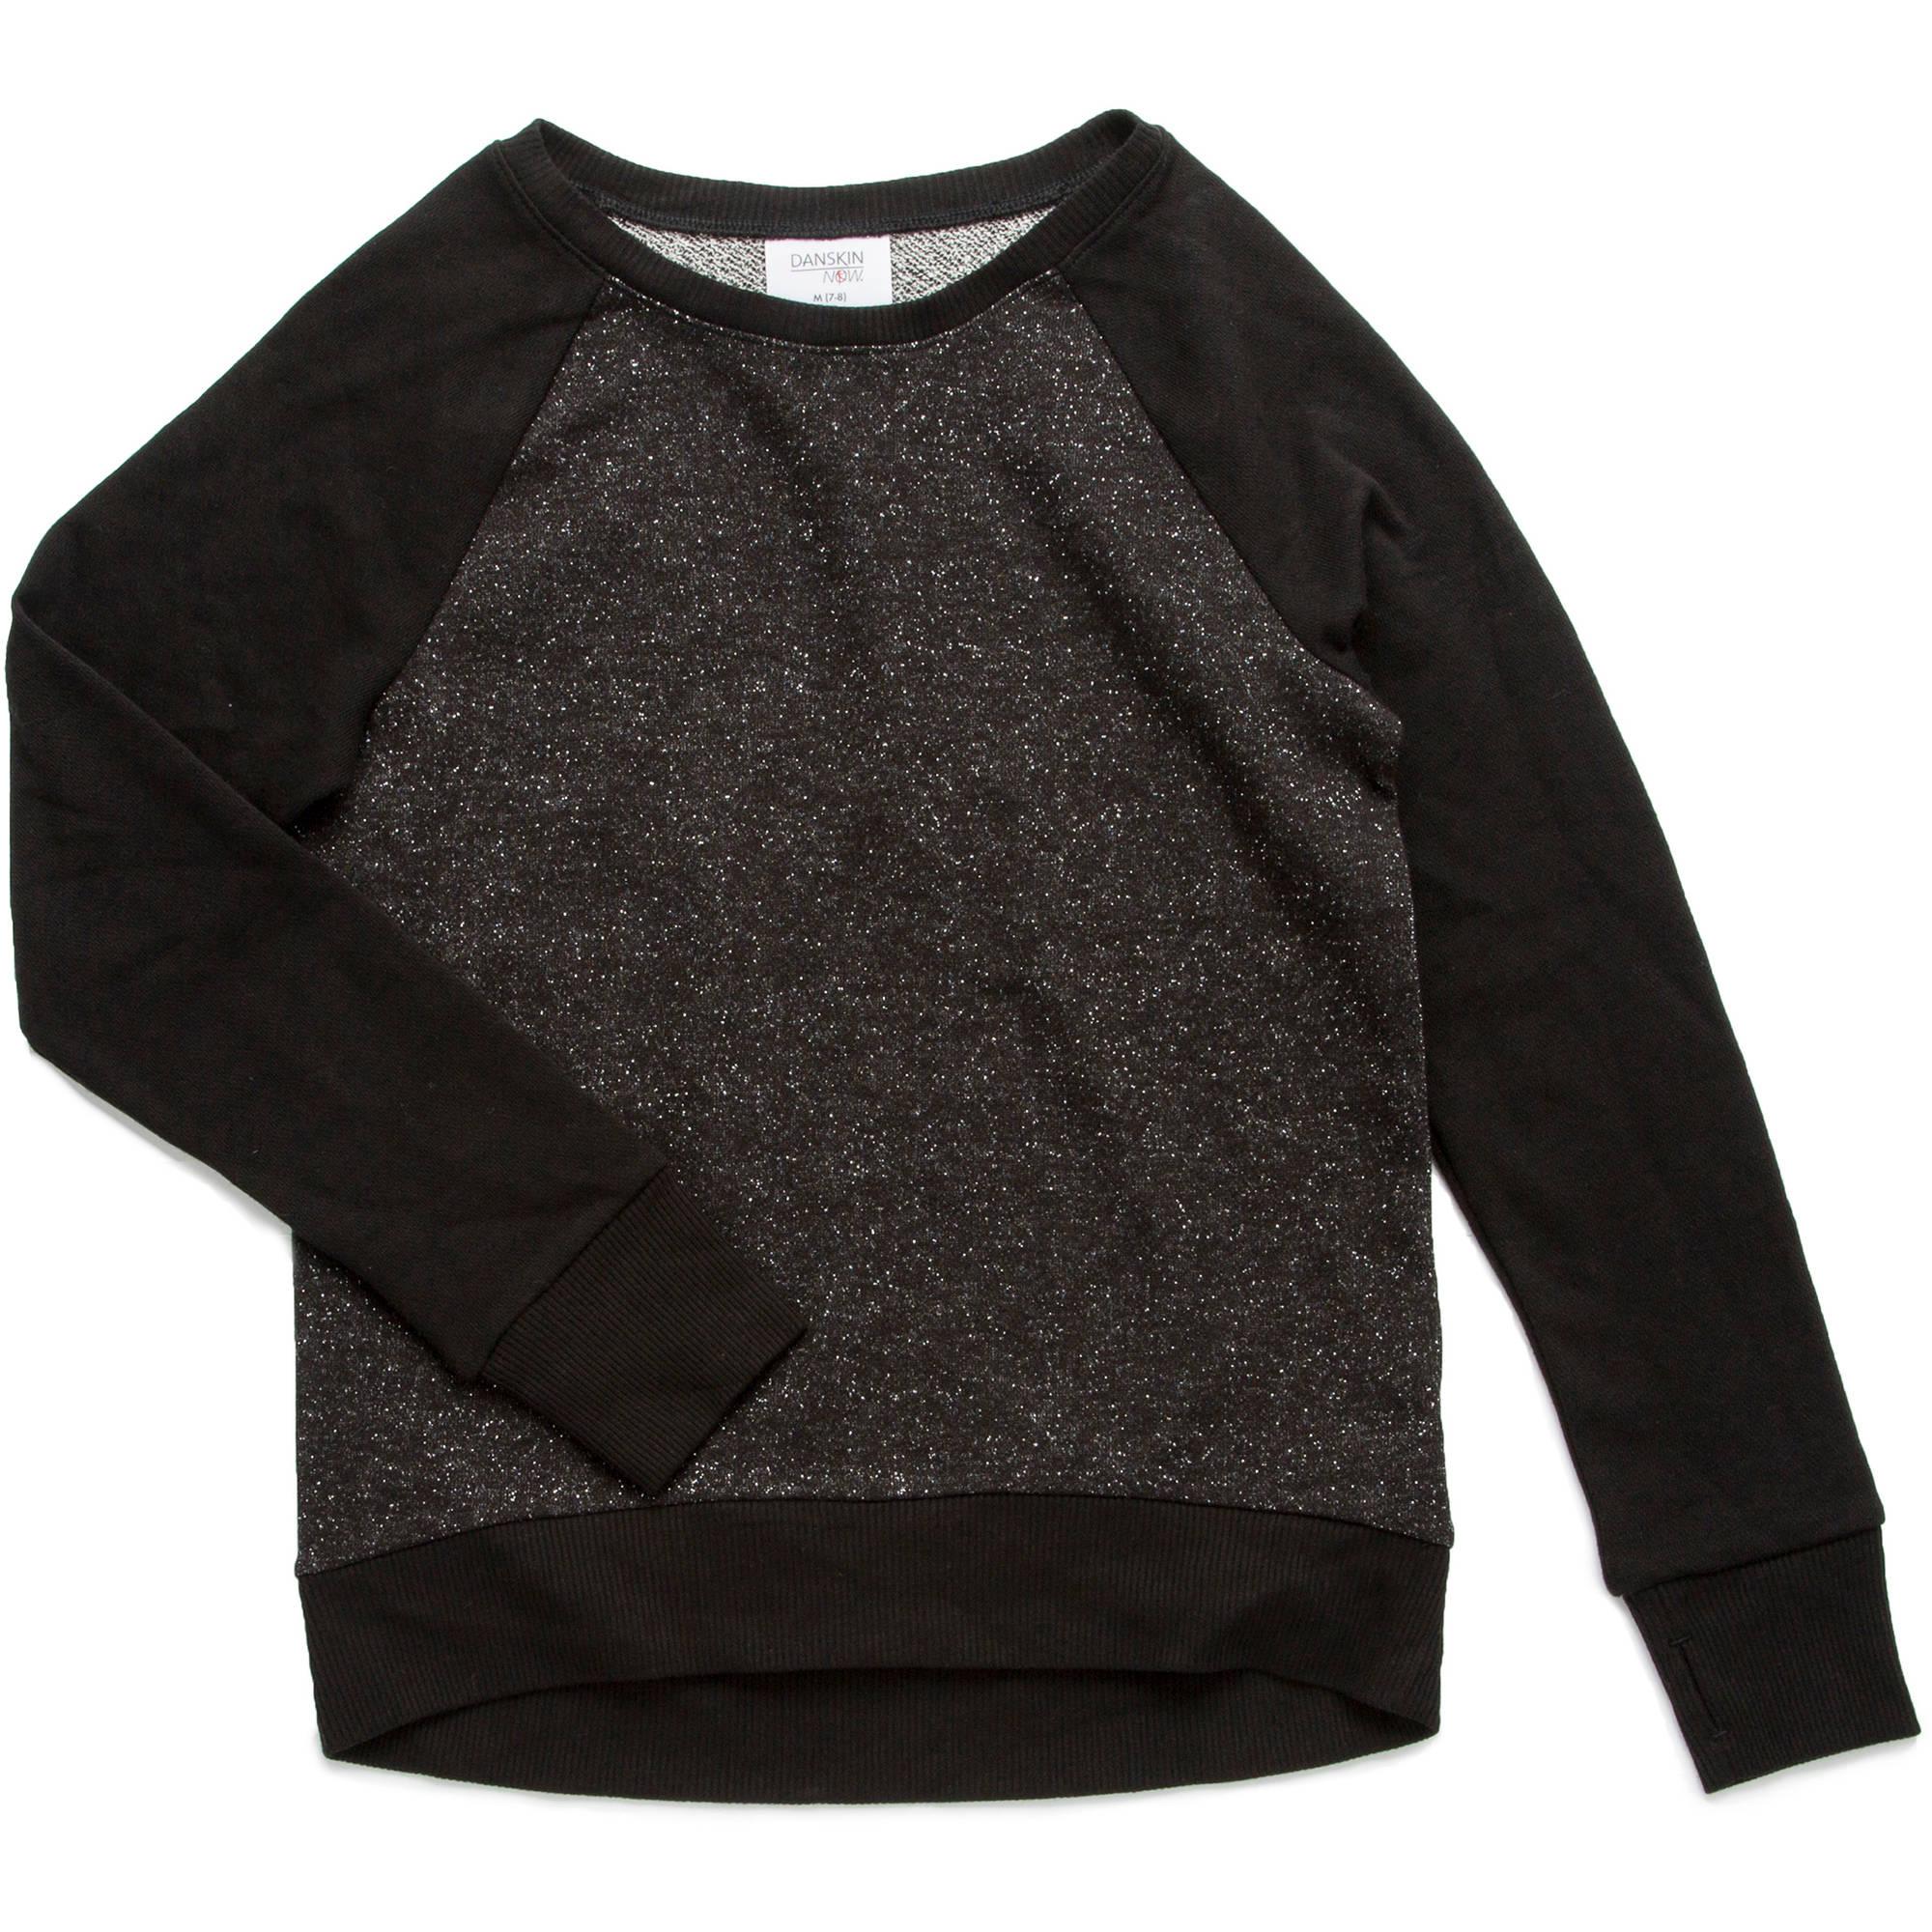 Danskin Now Girls' French Terry Sweatshirt